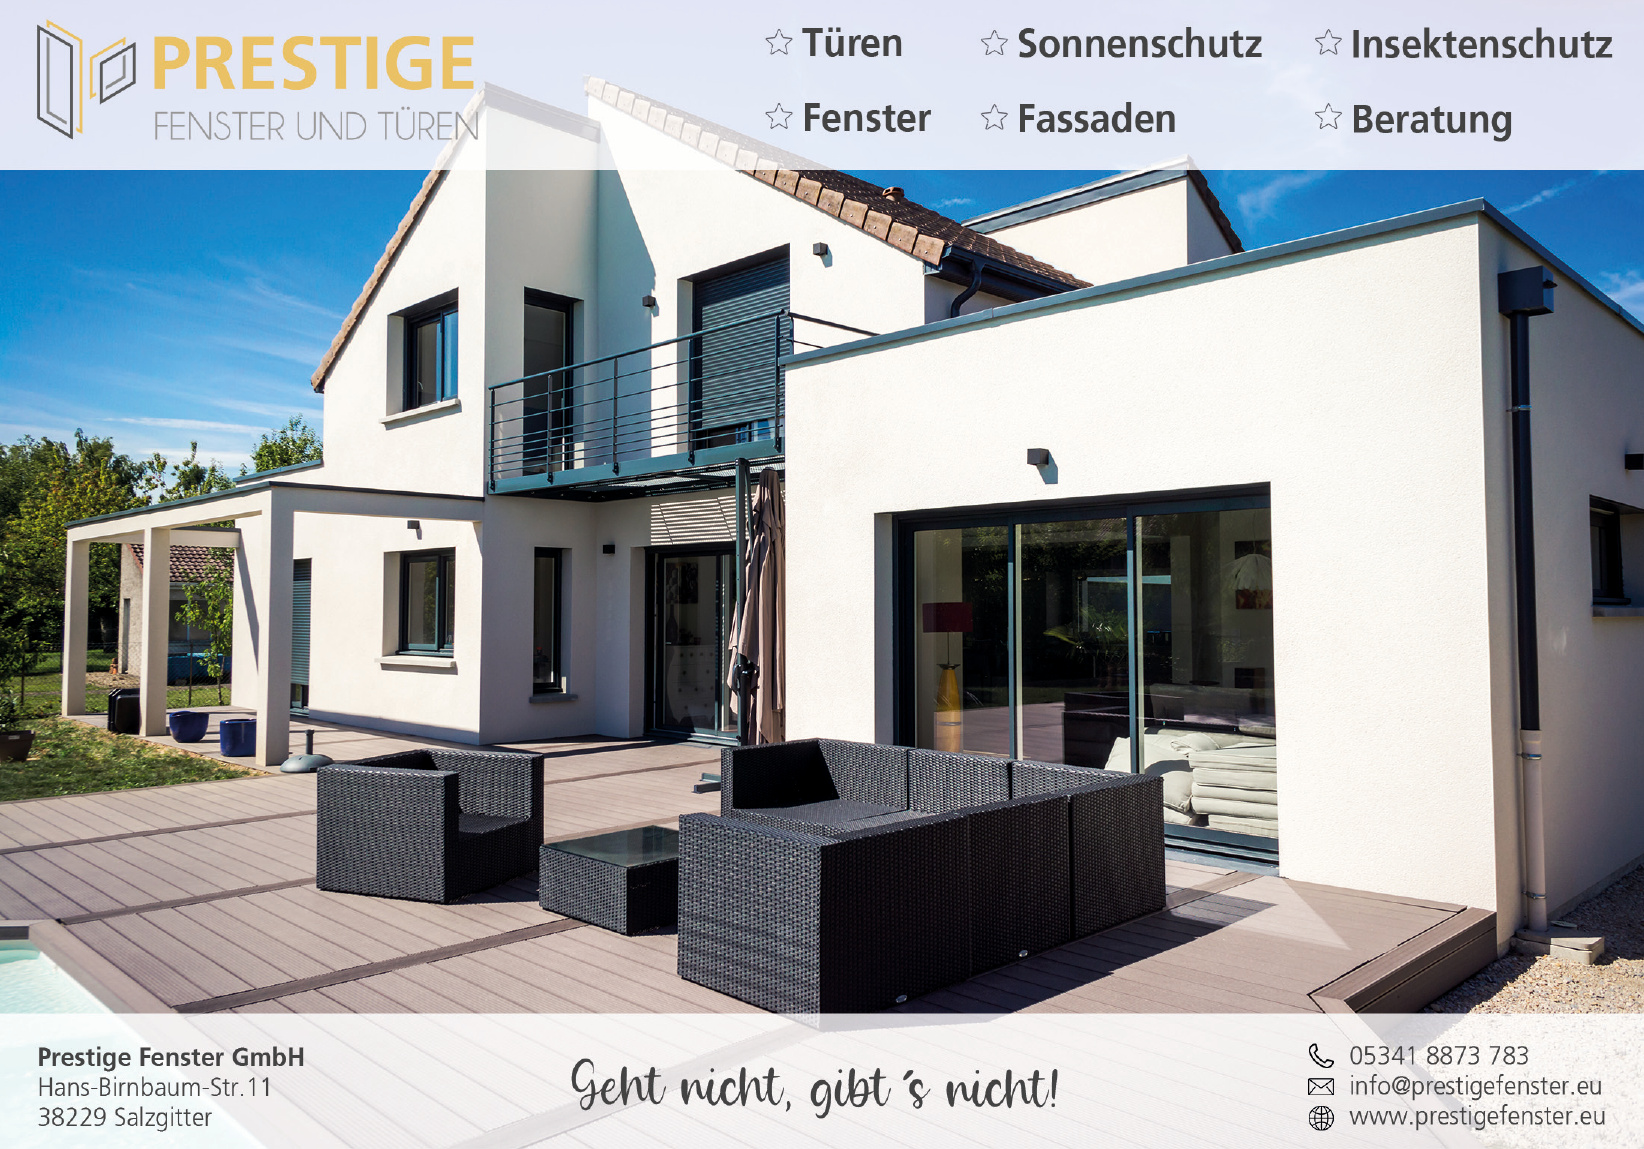 Prestige Fenster Gmbh